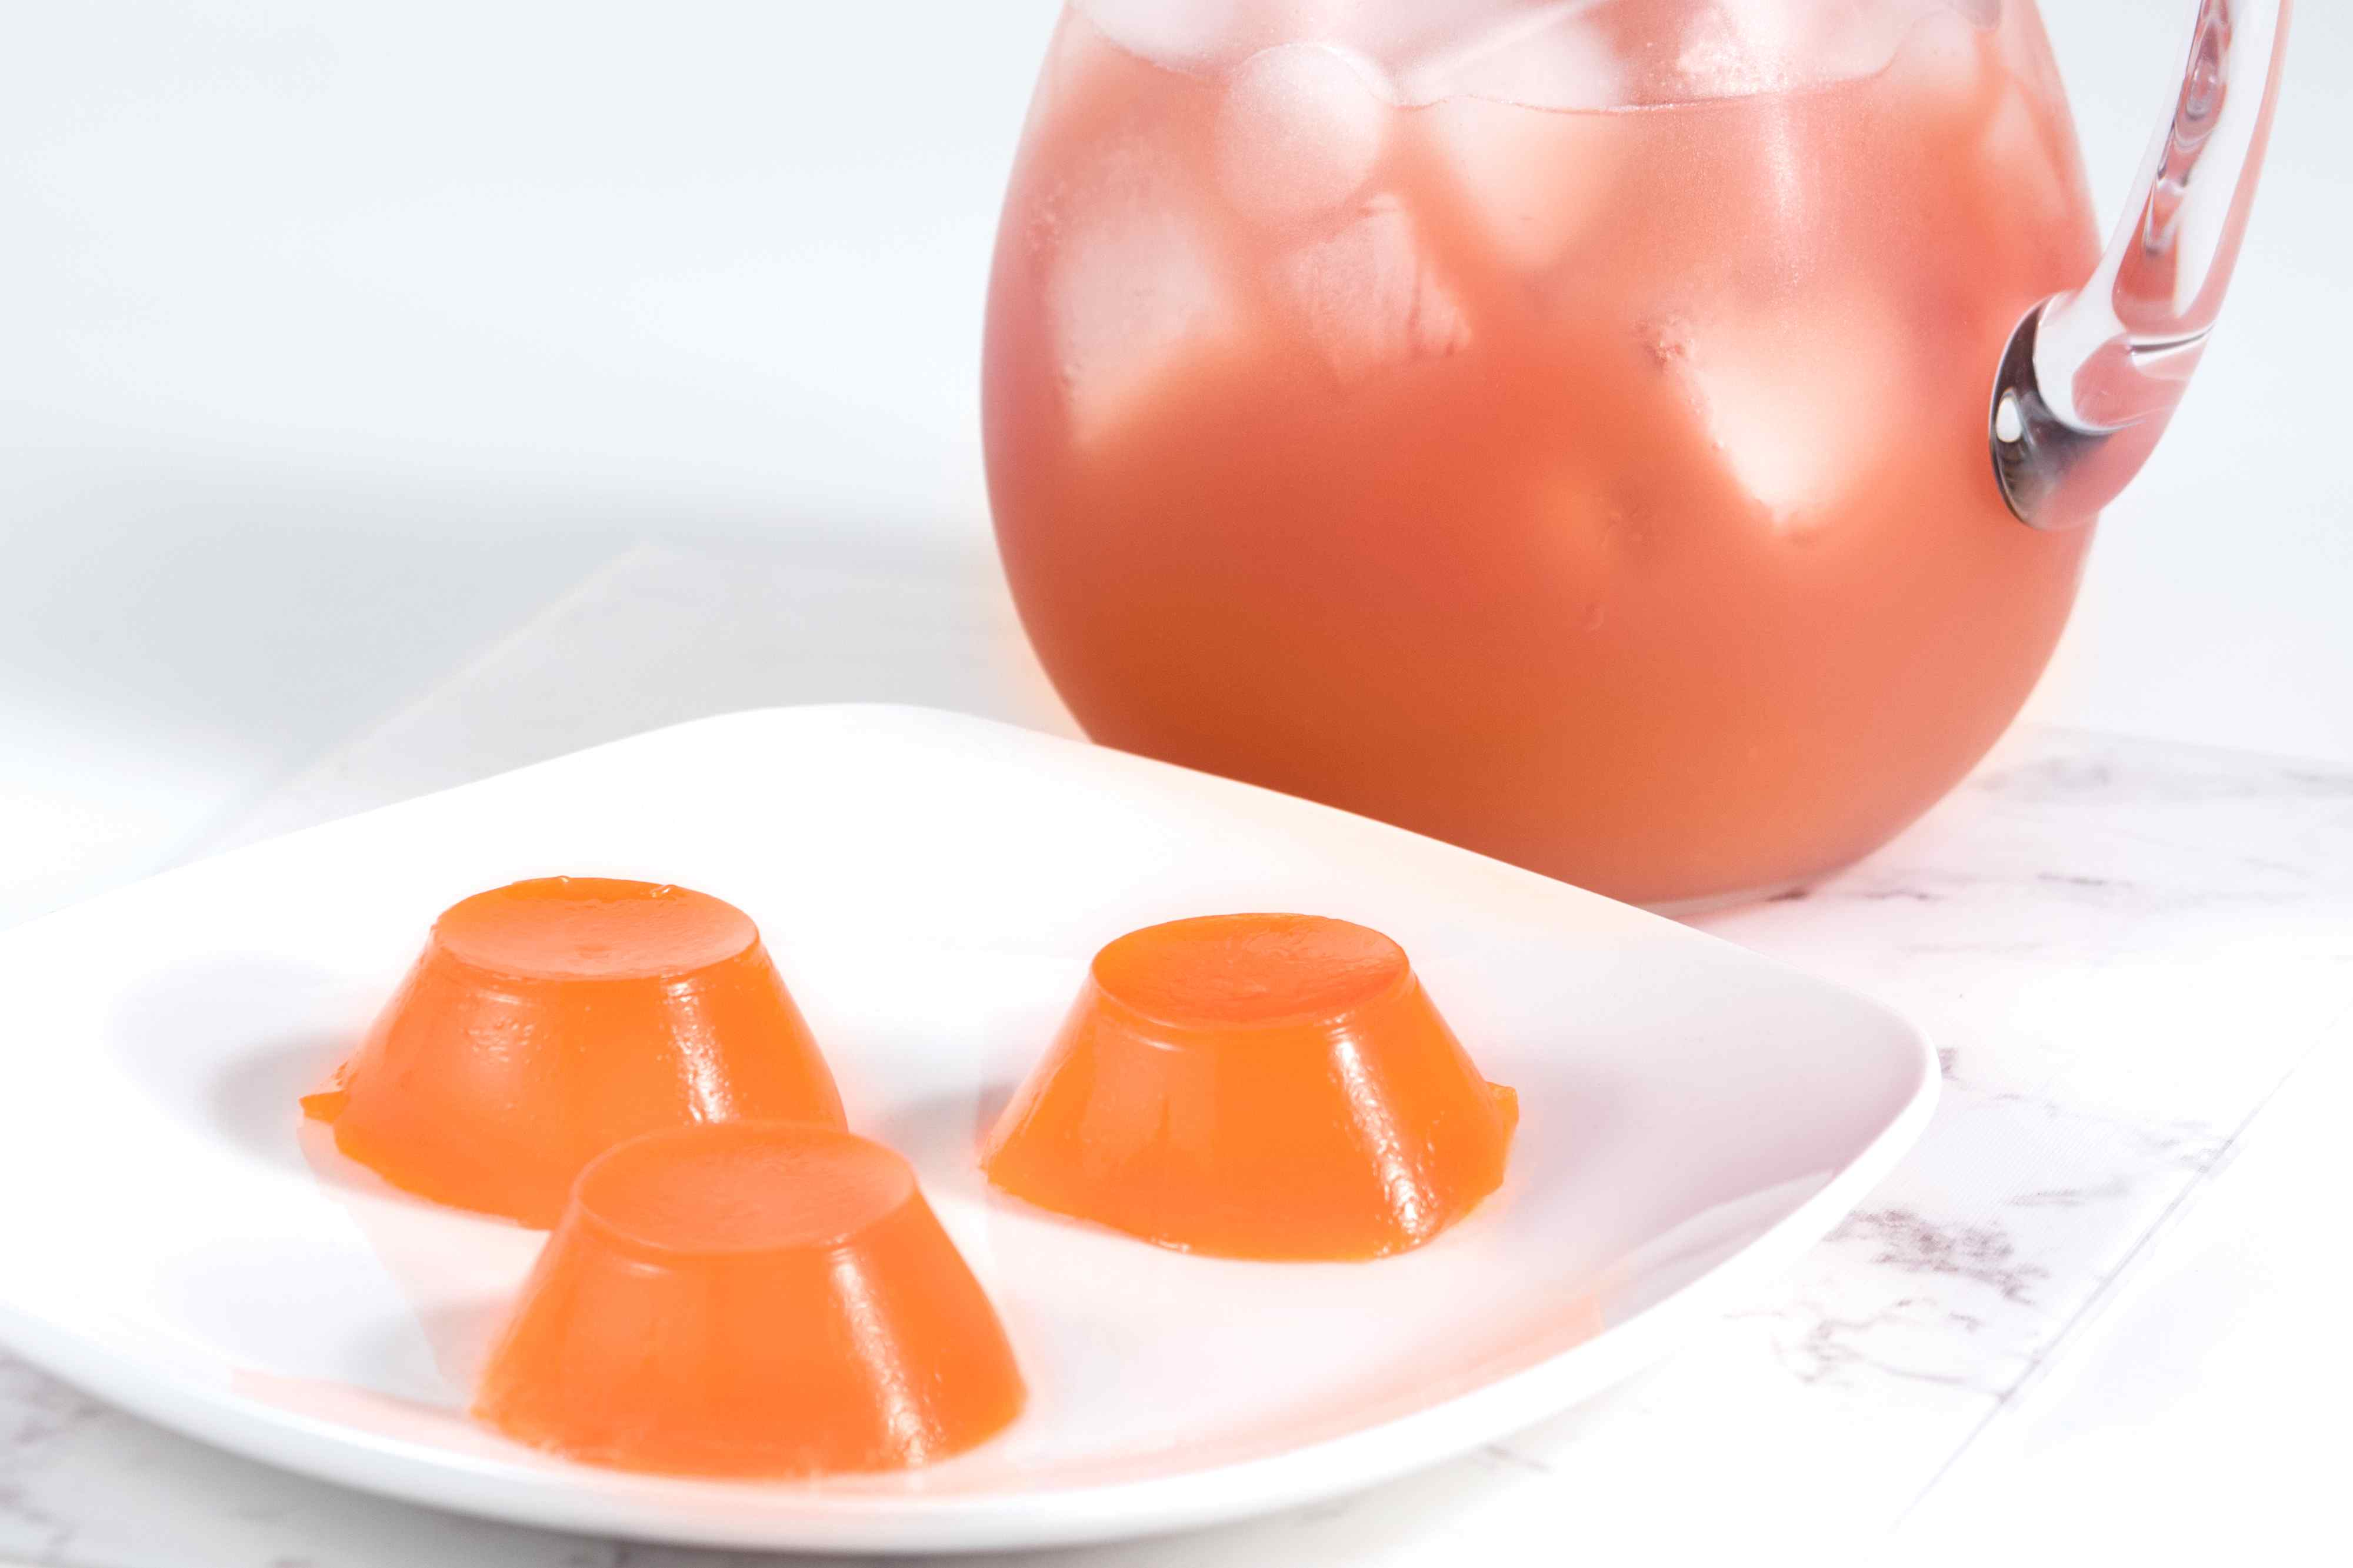 Sex on the beach jello shots in an orange